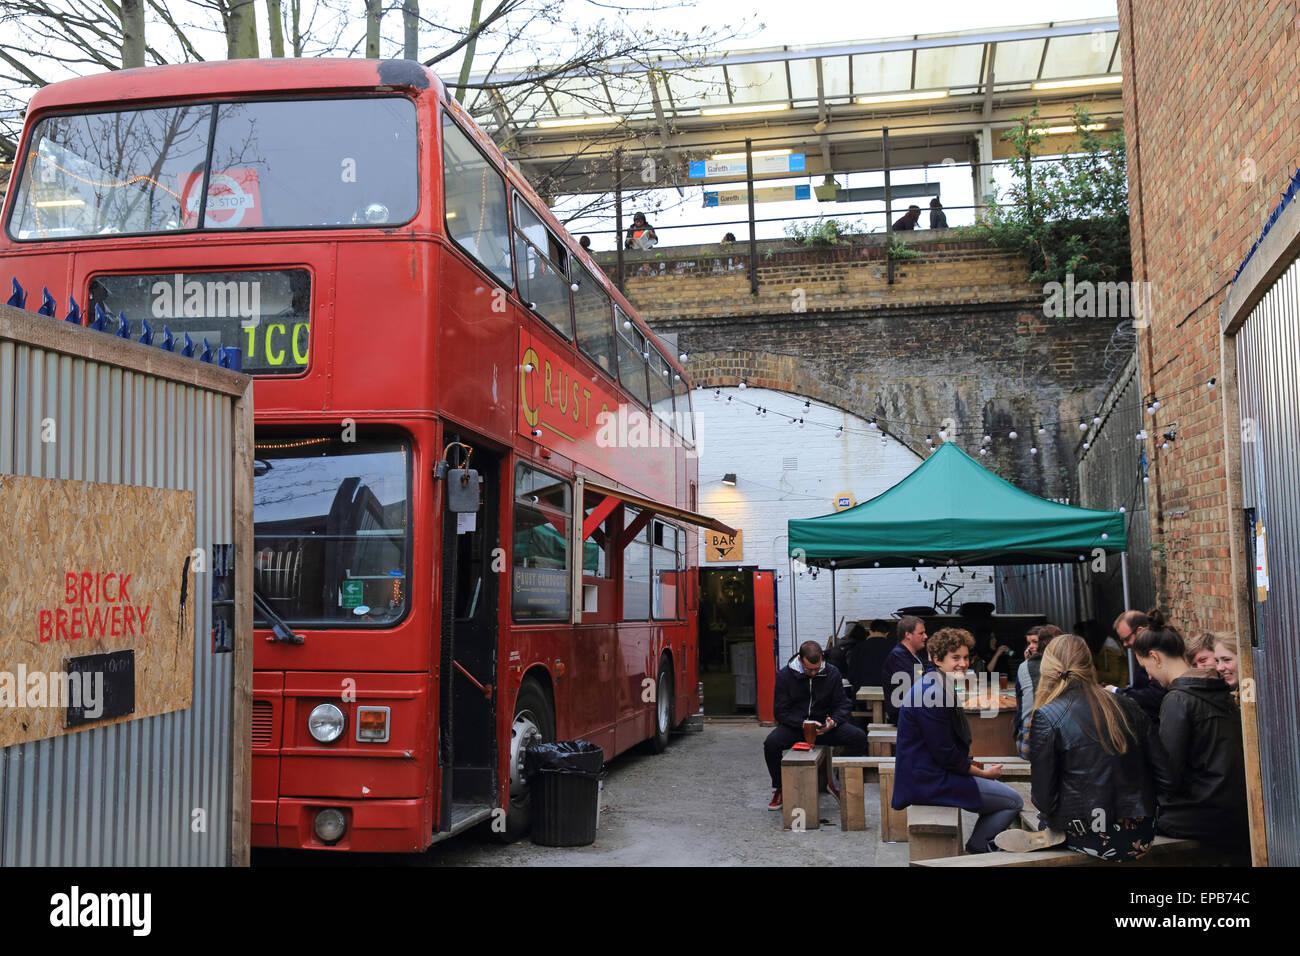 Der schrullige umgebaute Bus Kruste Dirigent pop-up-Restaurant, im trendigen Peckham Rye in SE London, England, Stockbild